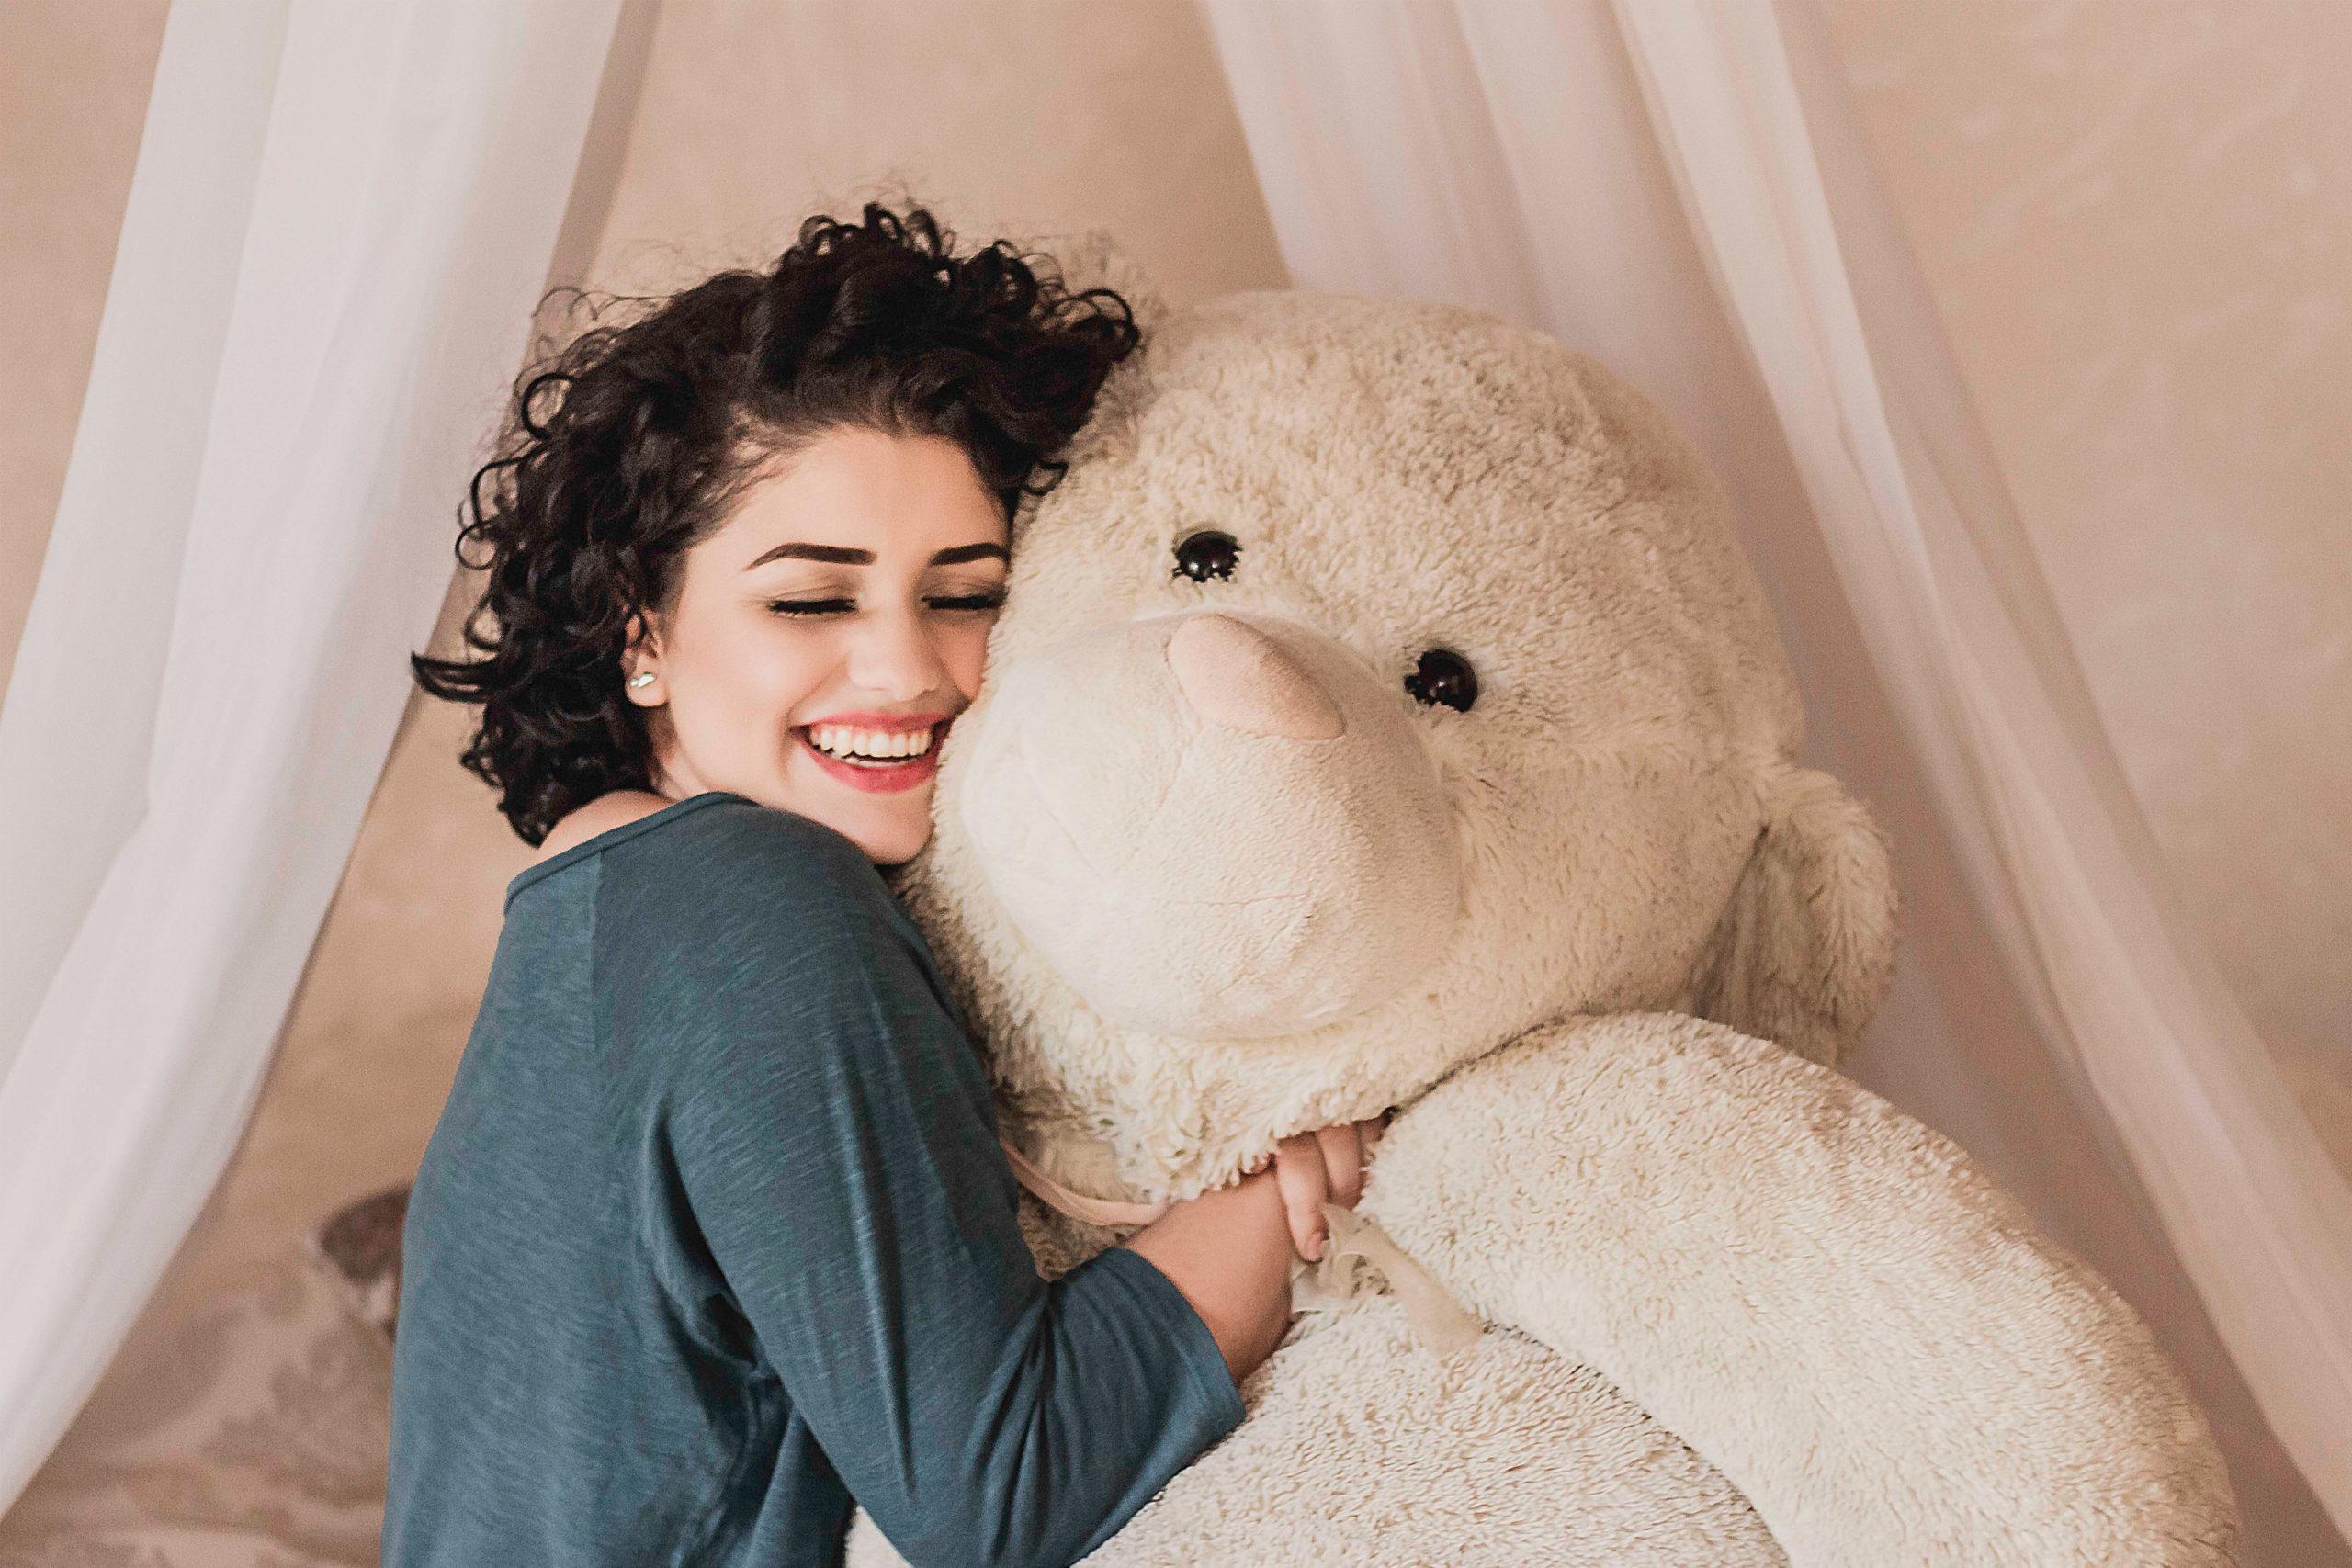 a woman hugging a giant teddy